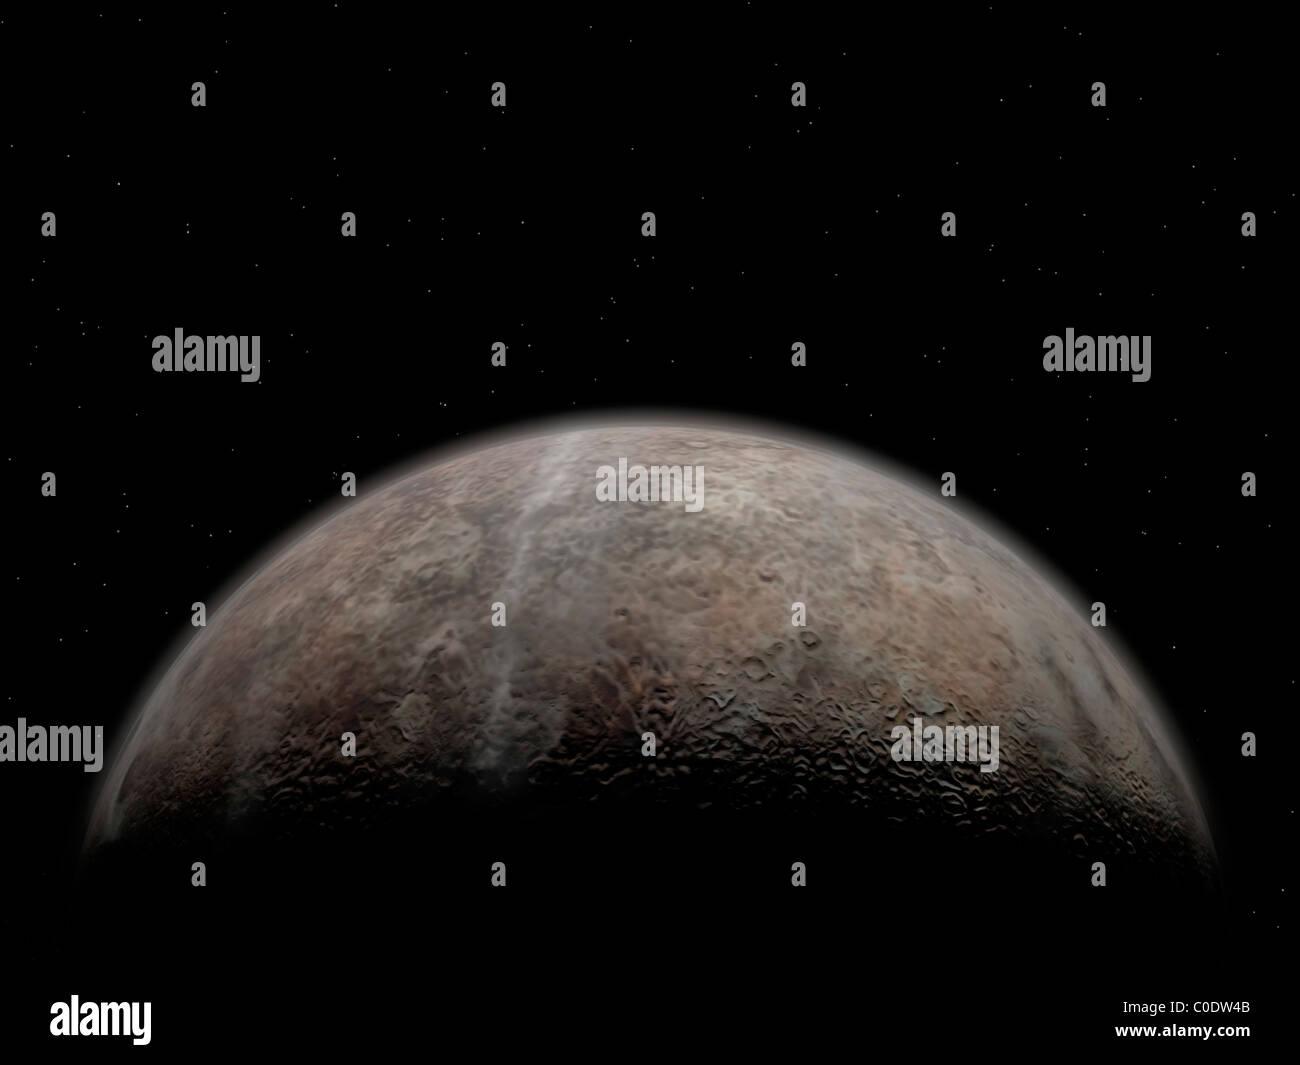 Artist's concept of Pluto. - Stock Image